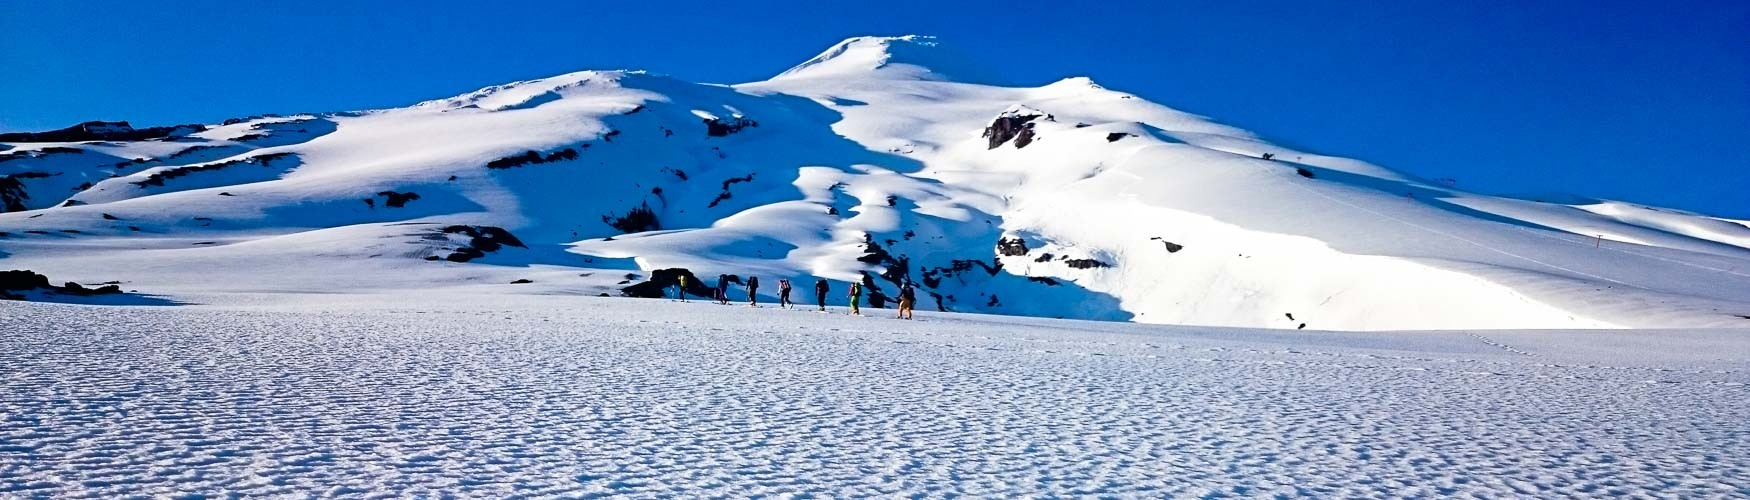 Chile Skifahren, Skitouren